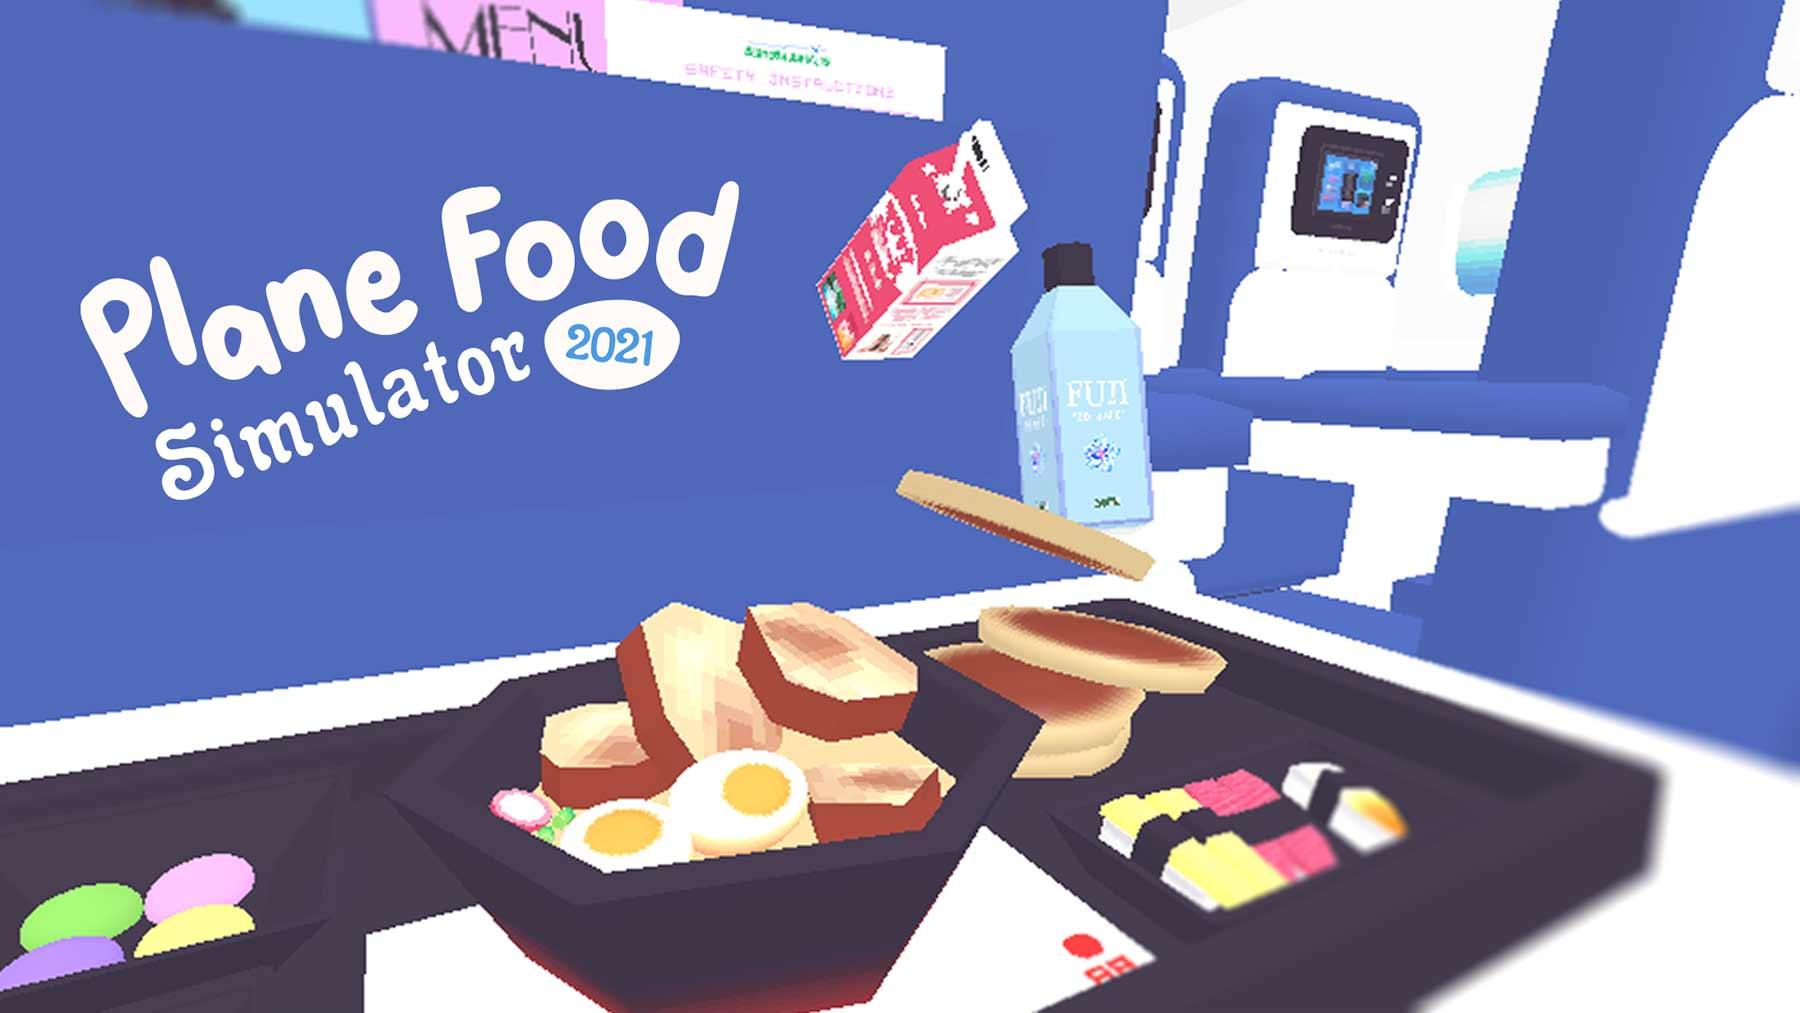 Flugzeug-Essen-Simulator Plane-Food-Simulator-2021